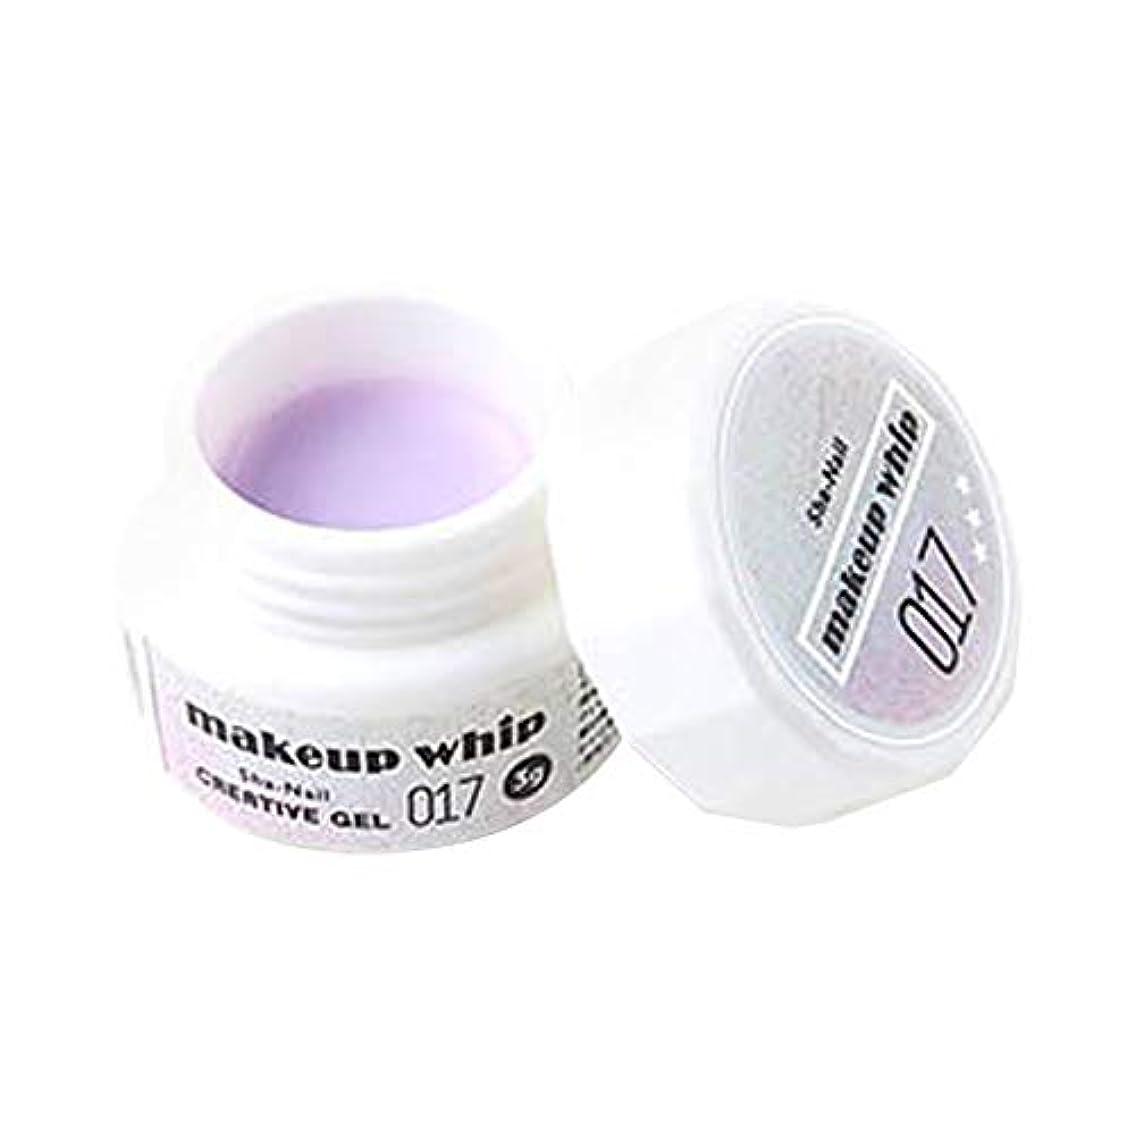 Sha-Nail Creative Gel カラージェル 017 オーロラピンク 3g UV/LED対応